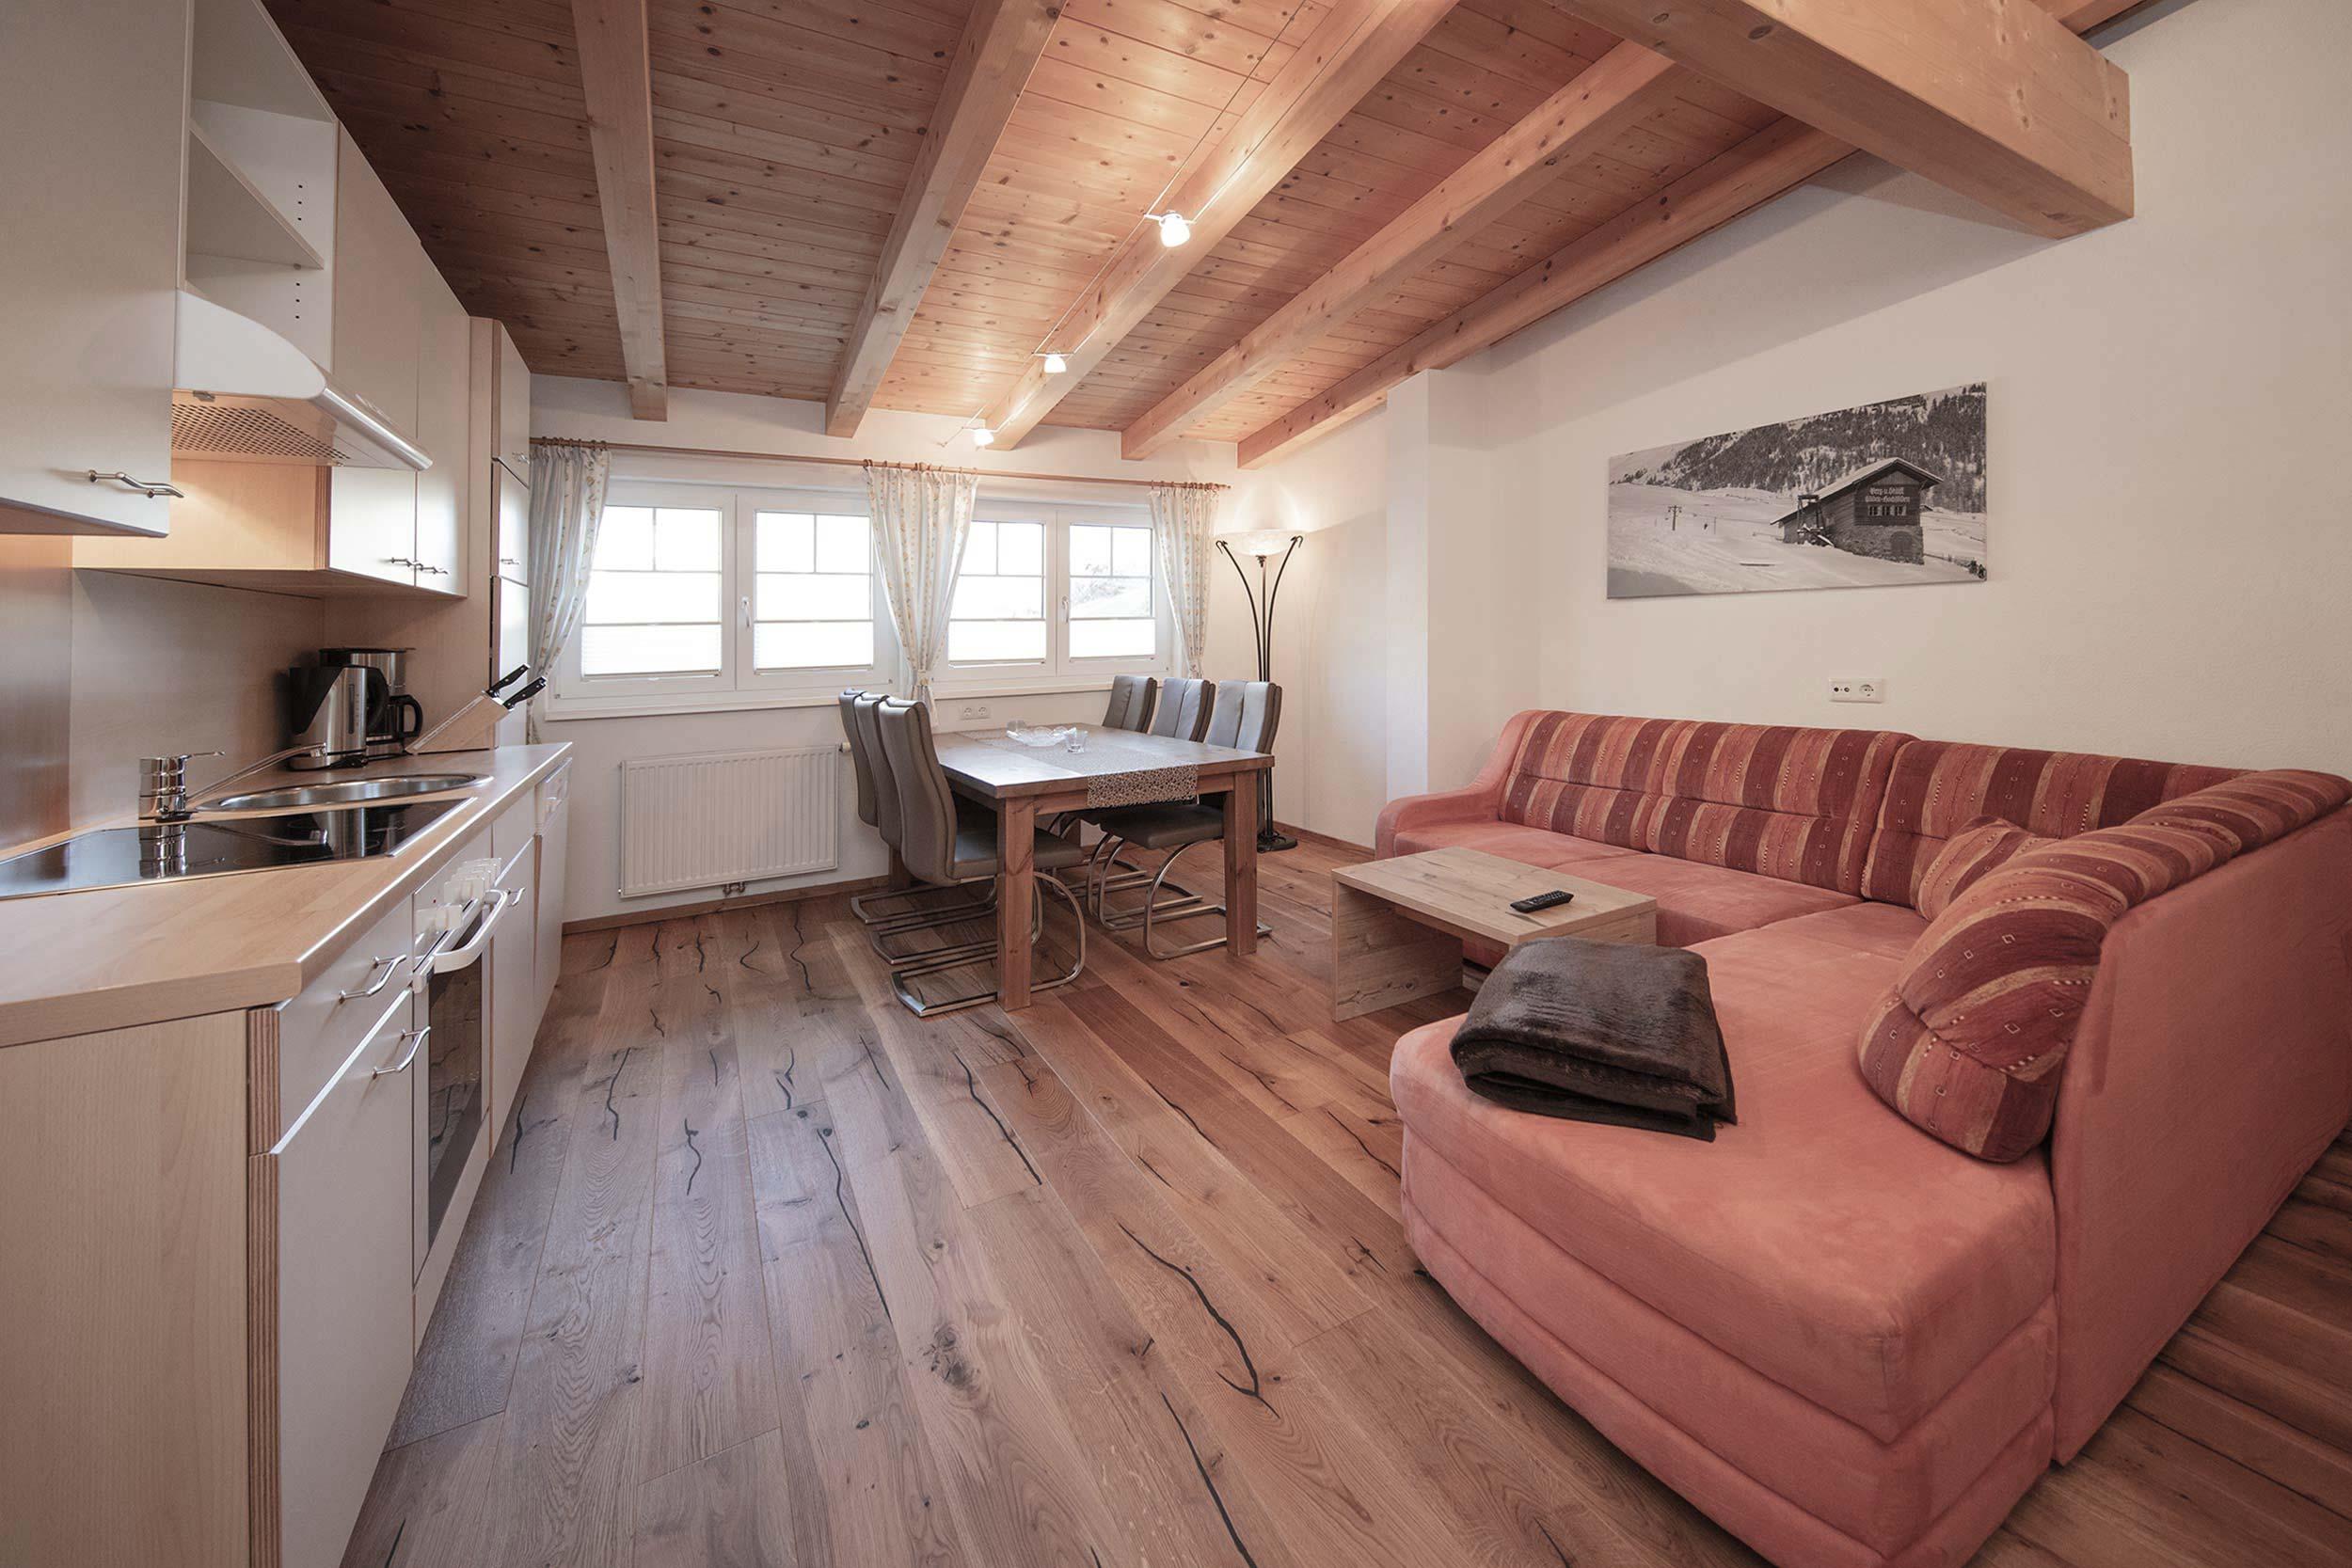 Apartment 3 Wohnraum